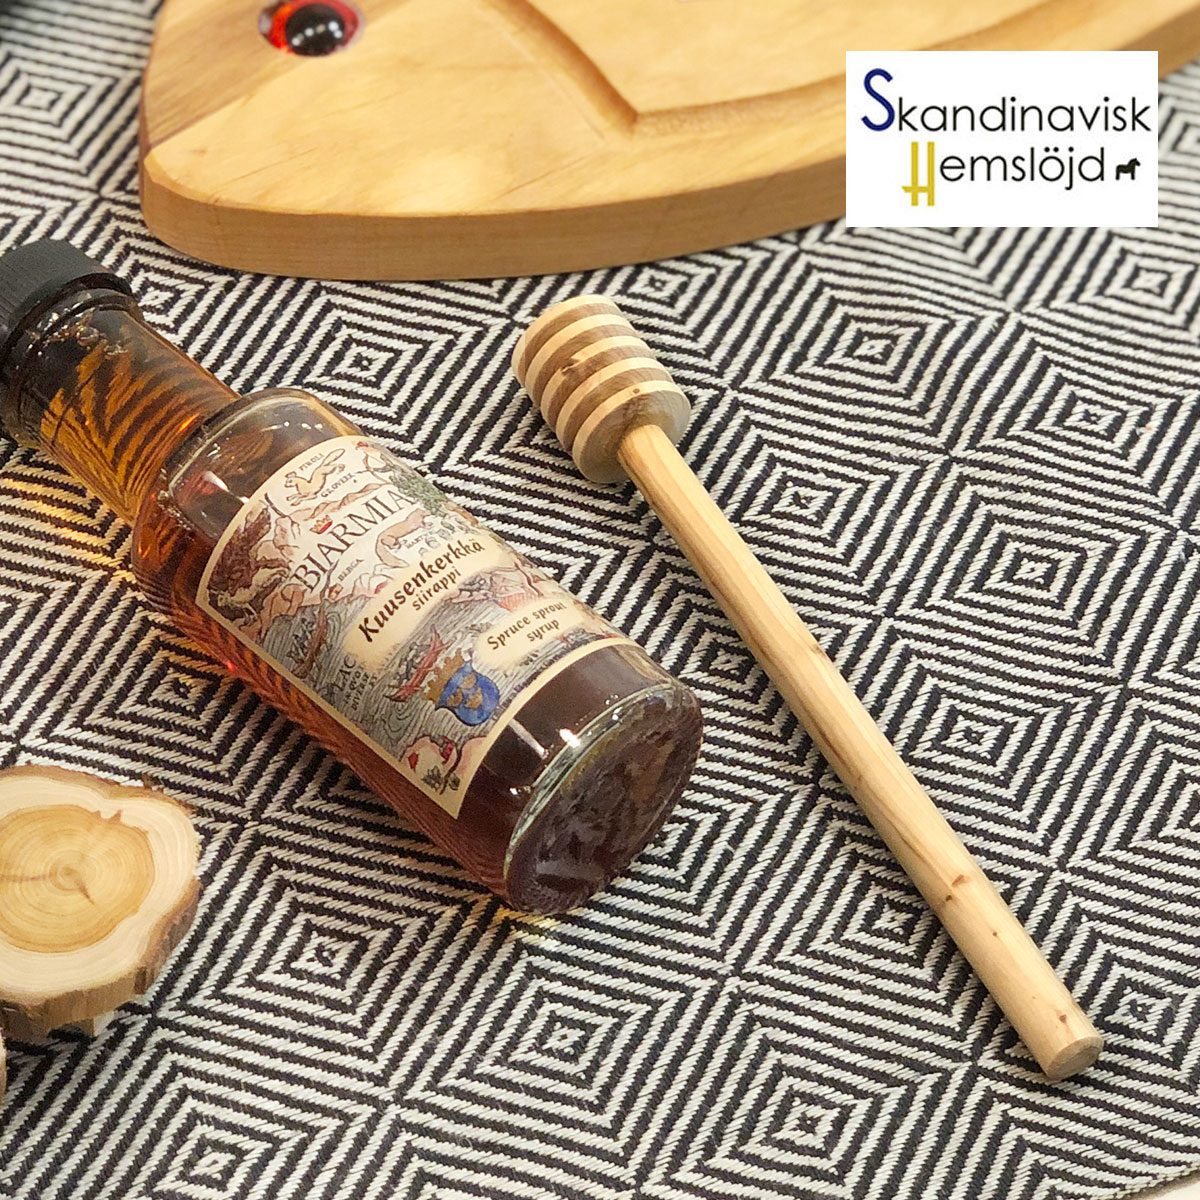 SkandinaviskH スカンジナヴィスク はちみつスプーン 木製 おしゃれな北欧食器 職人の手作り スウェーデン 天然木 インテリアにも キッチン雑貨 プレゼント シンプルで美しいデザイン 北欧カトラリー プレゼントやギフトに人気 記念日 カフェ雑貨 商い